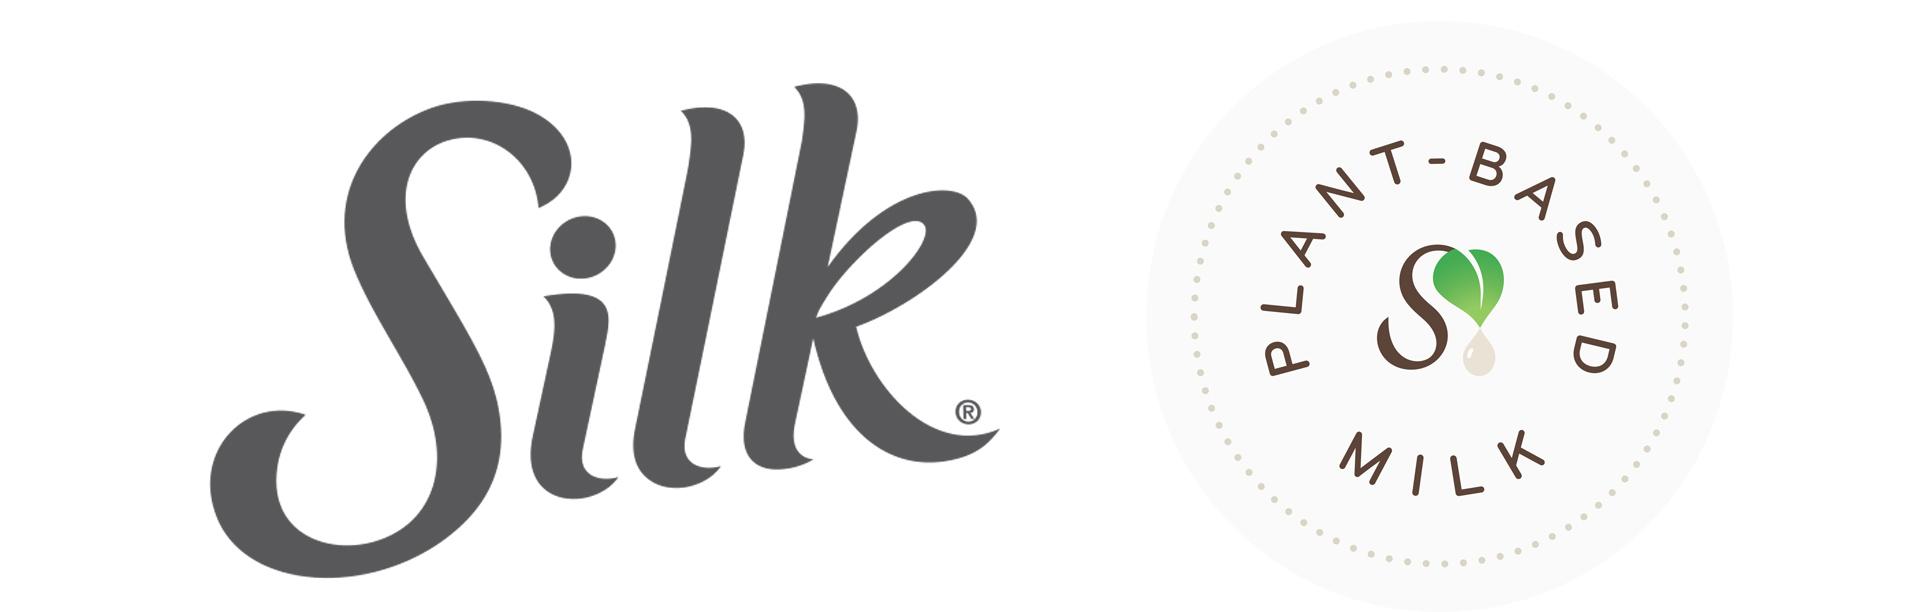 Silk logo redraw